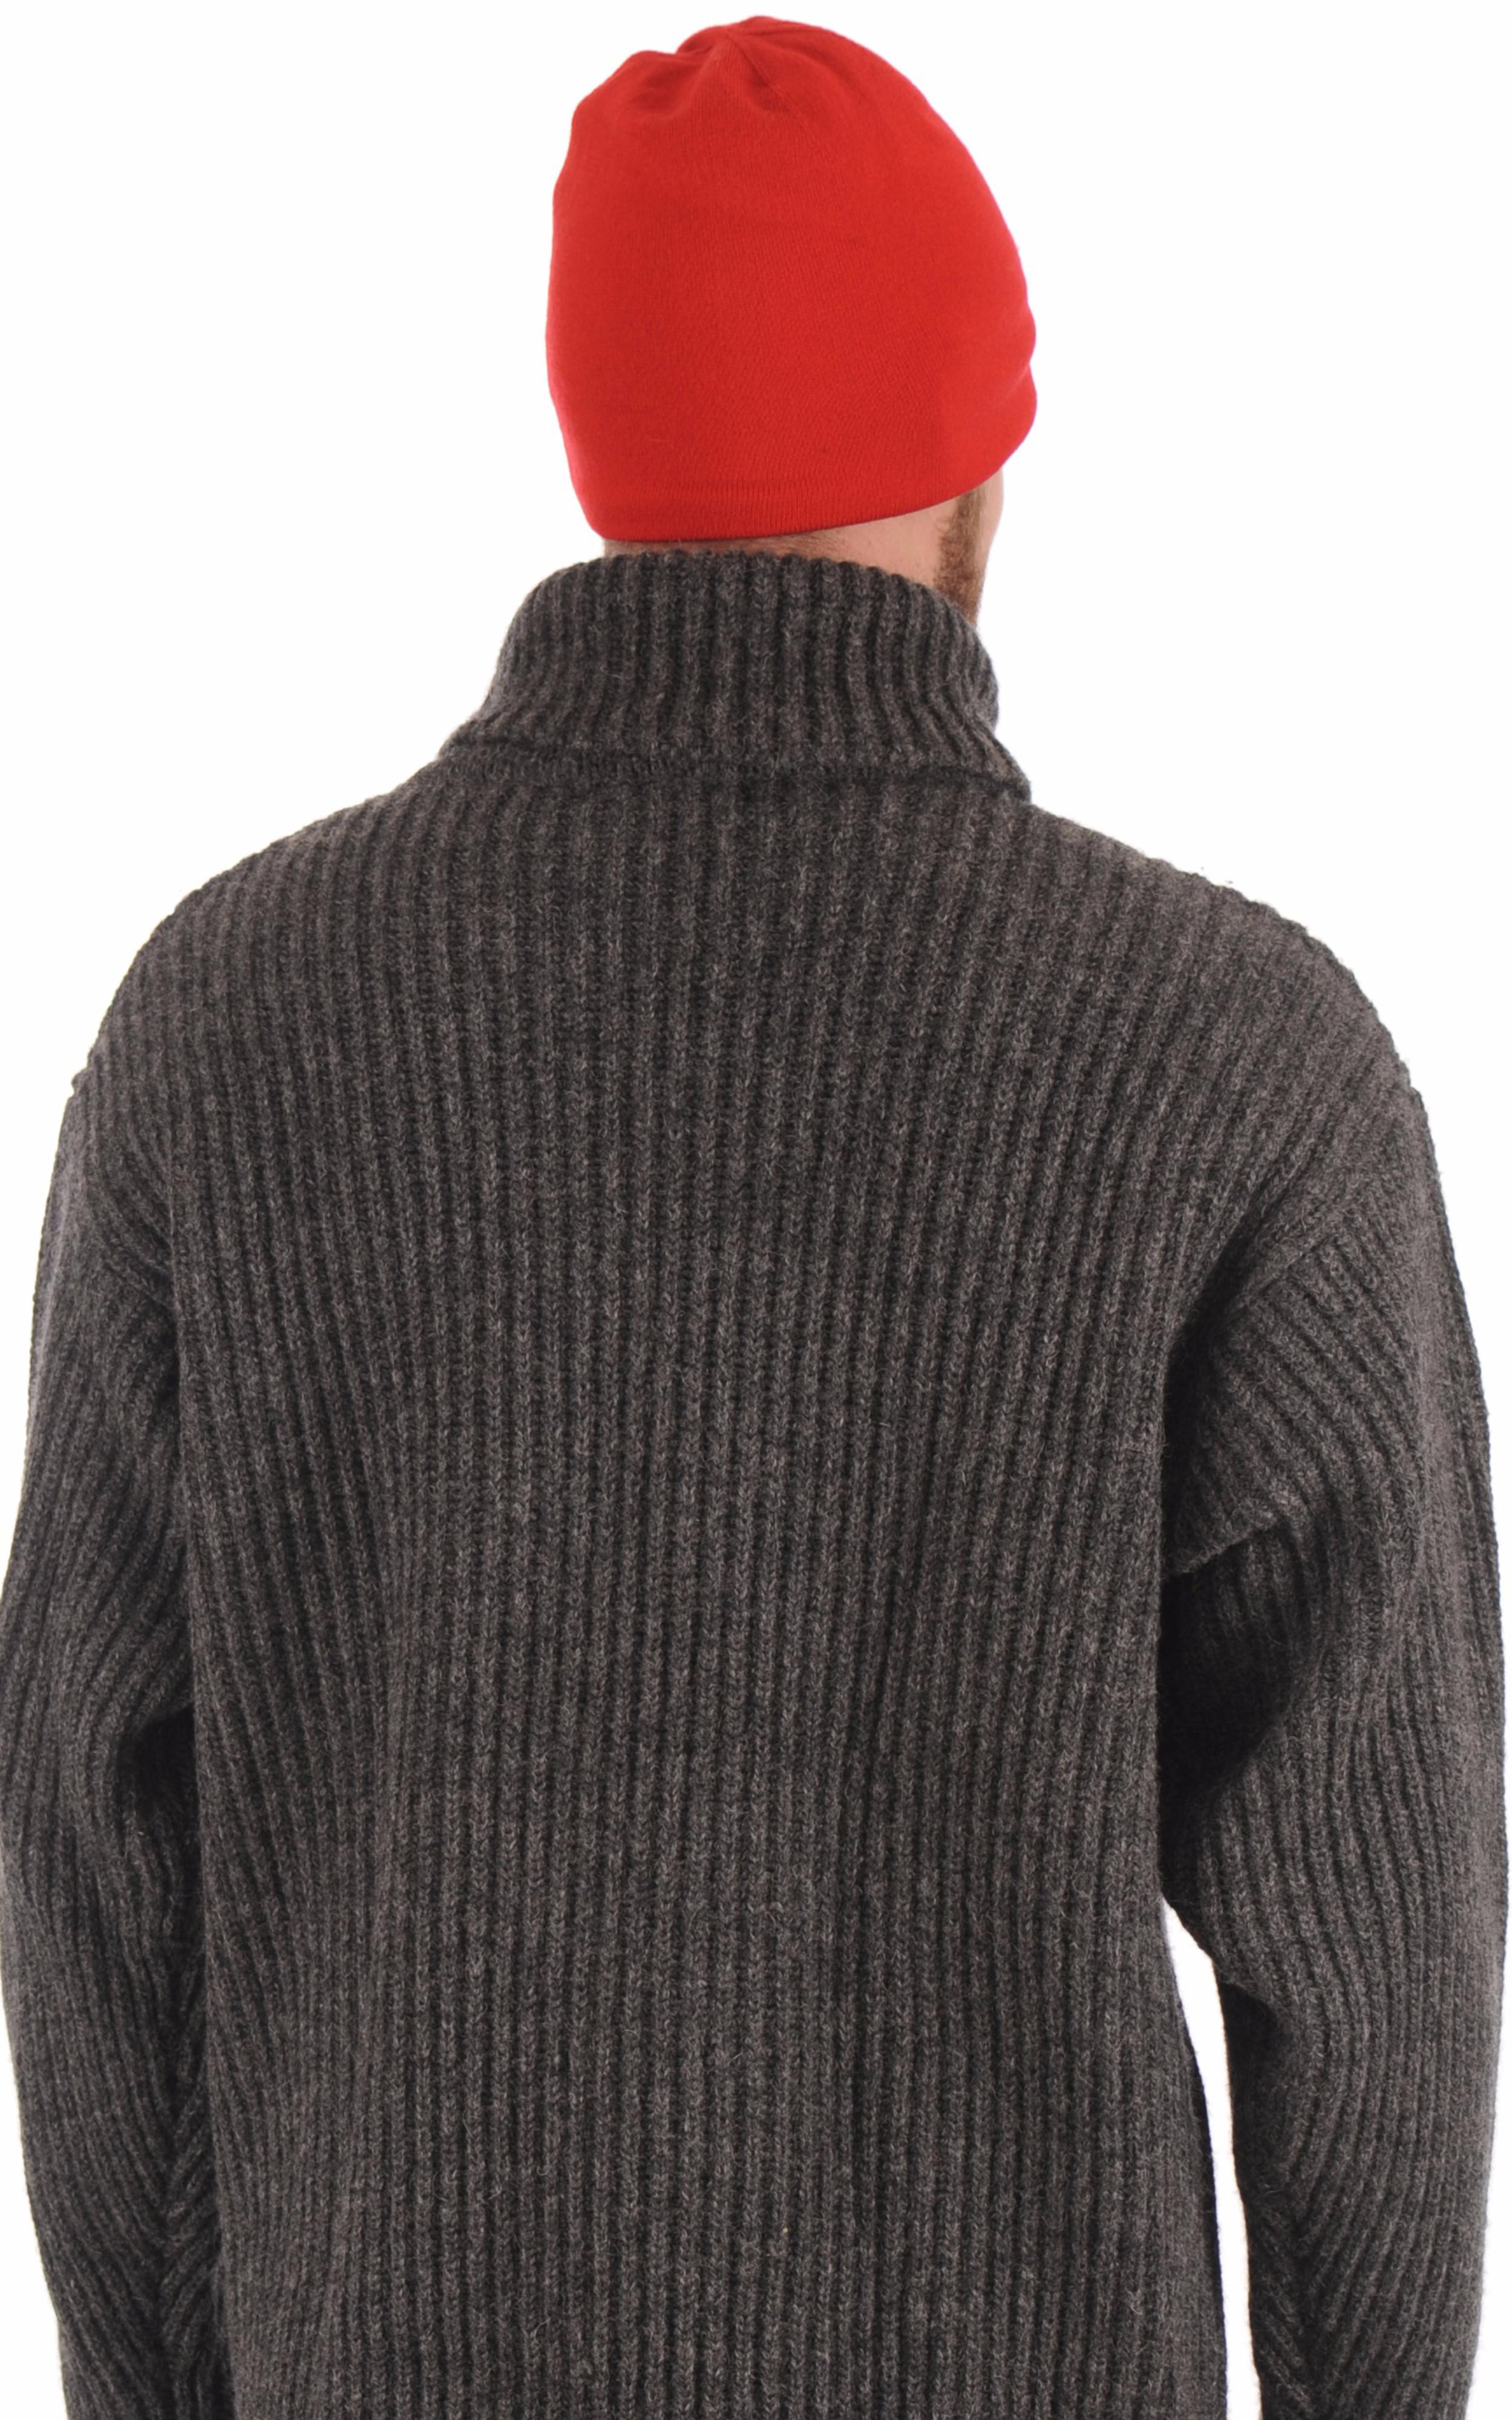 Bonnet Standard rouge Canada Goose